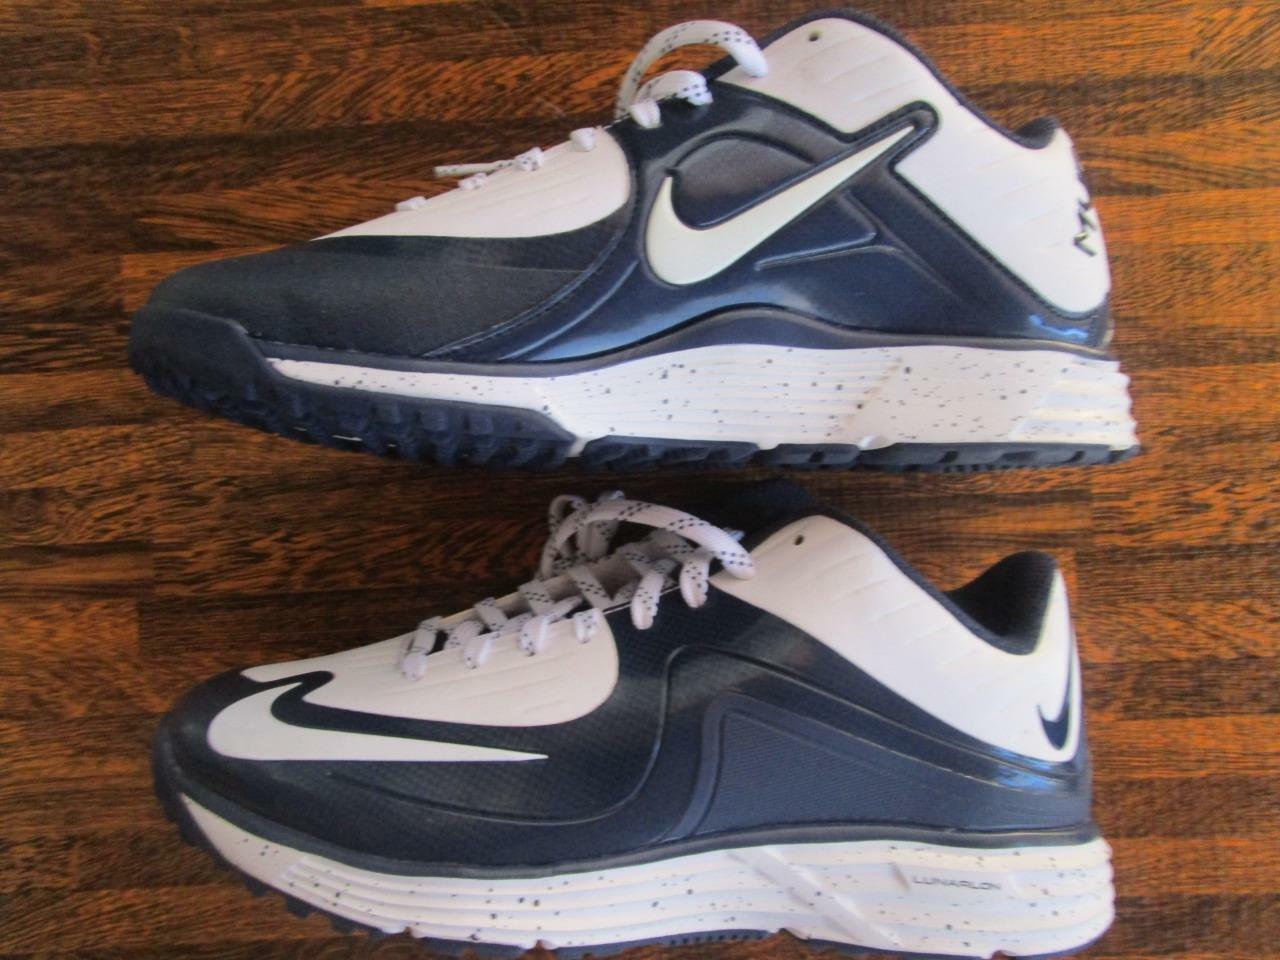 Nike Lunar MVP MVP MVP Baseball Pregame 2 Trainer Turf shoes Cleats 7.5 White Navy dccc5c